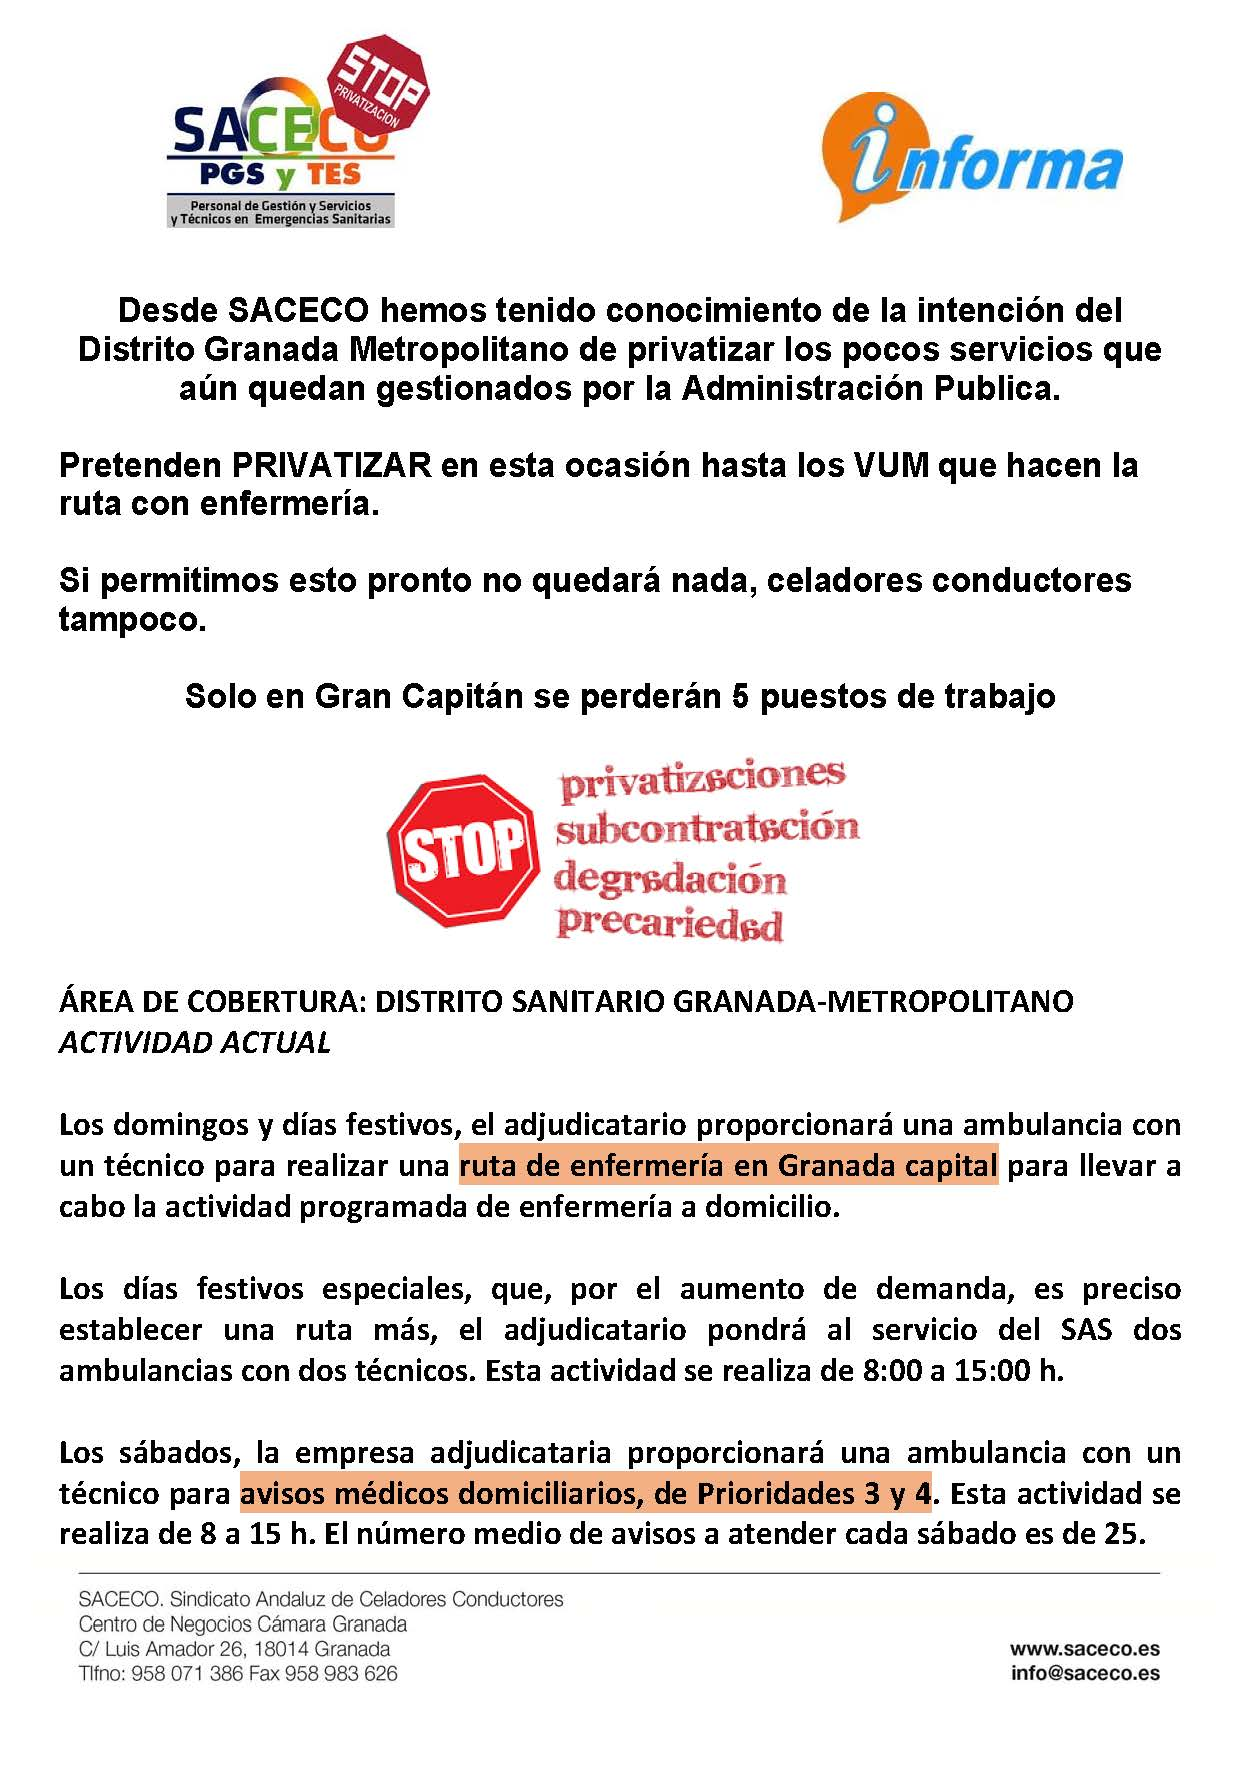 Privatizacion2